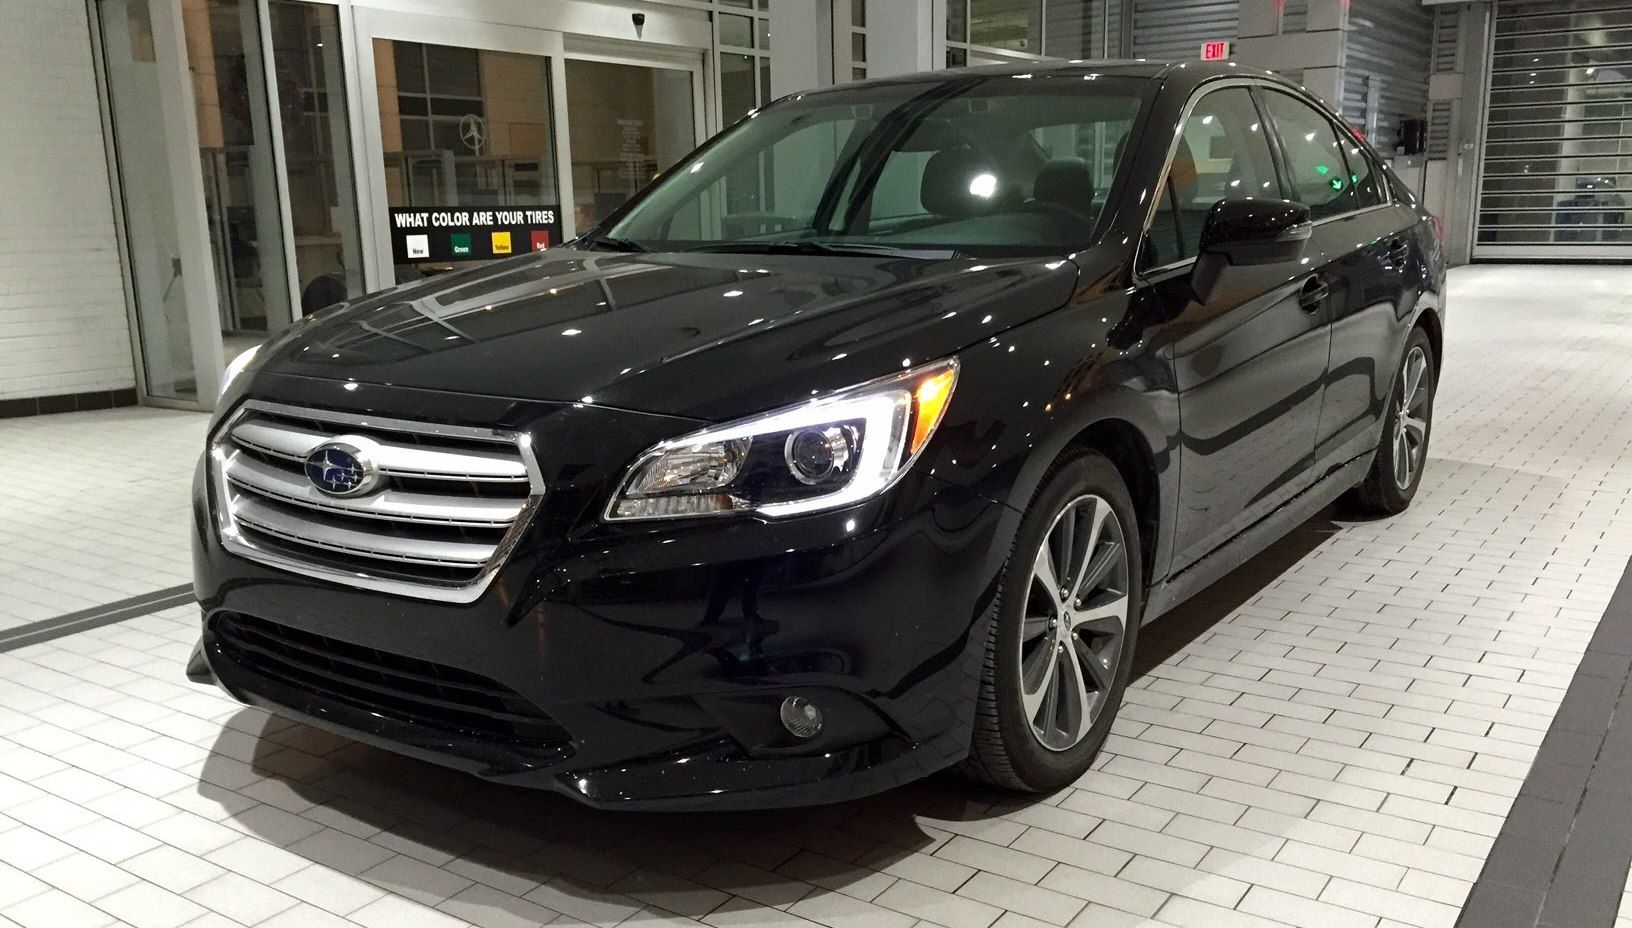 Subaru Legacy 2017 In Black